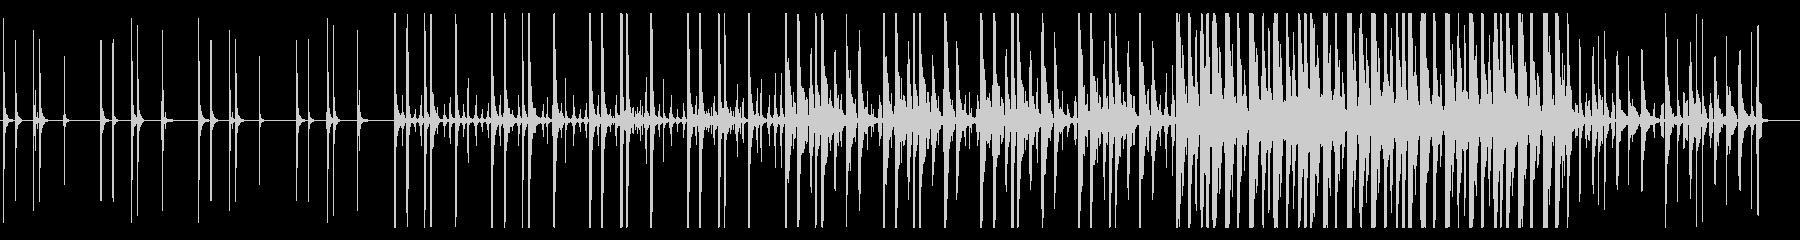 KANTハンズクラップジングル1の未再生の波形